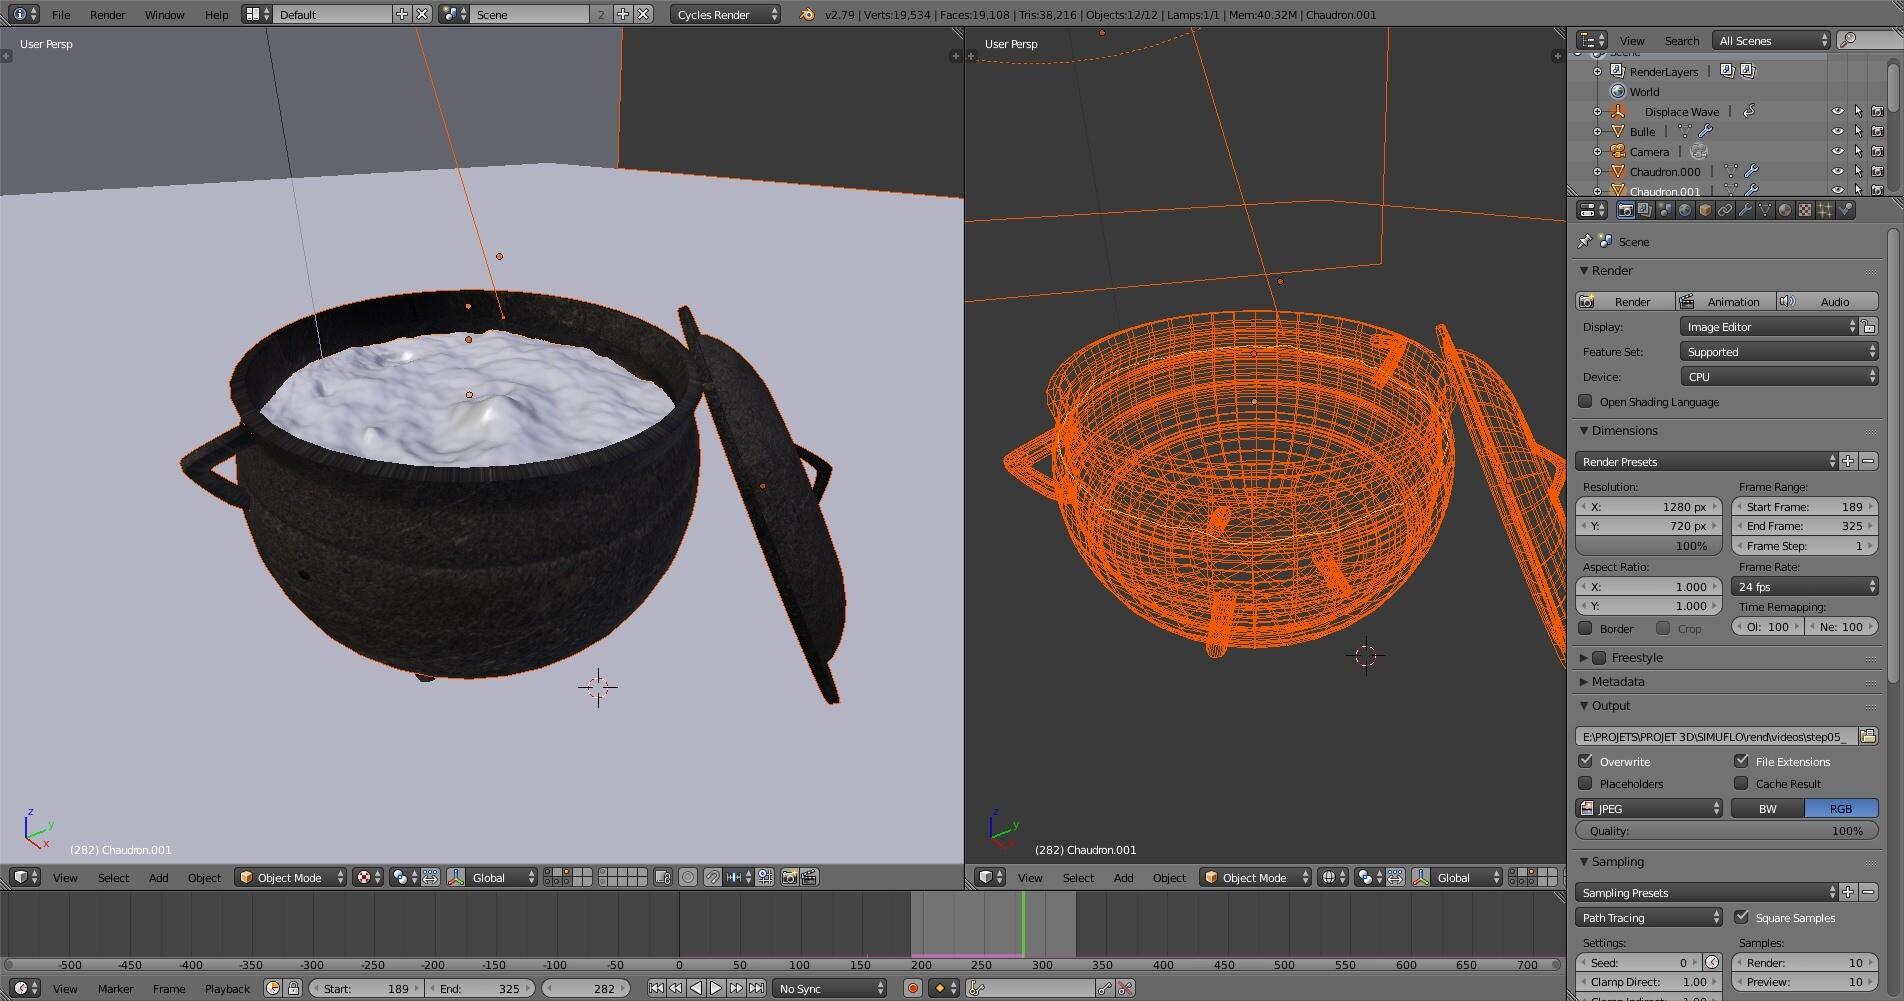 Gregory bove cauldron02